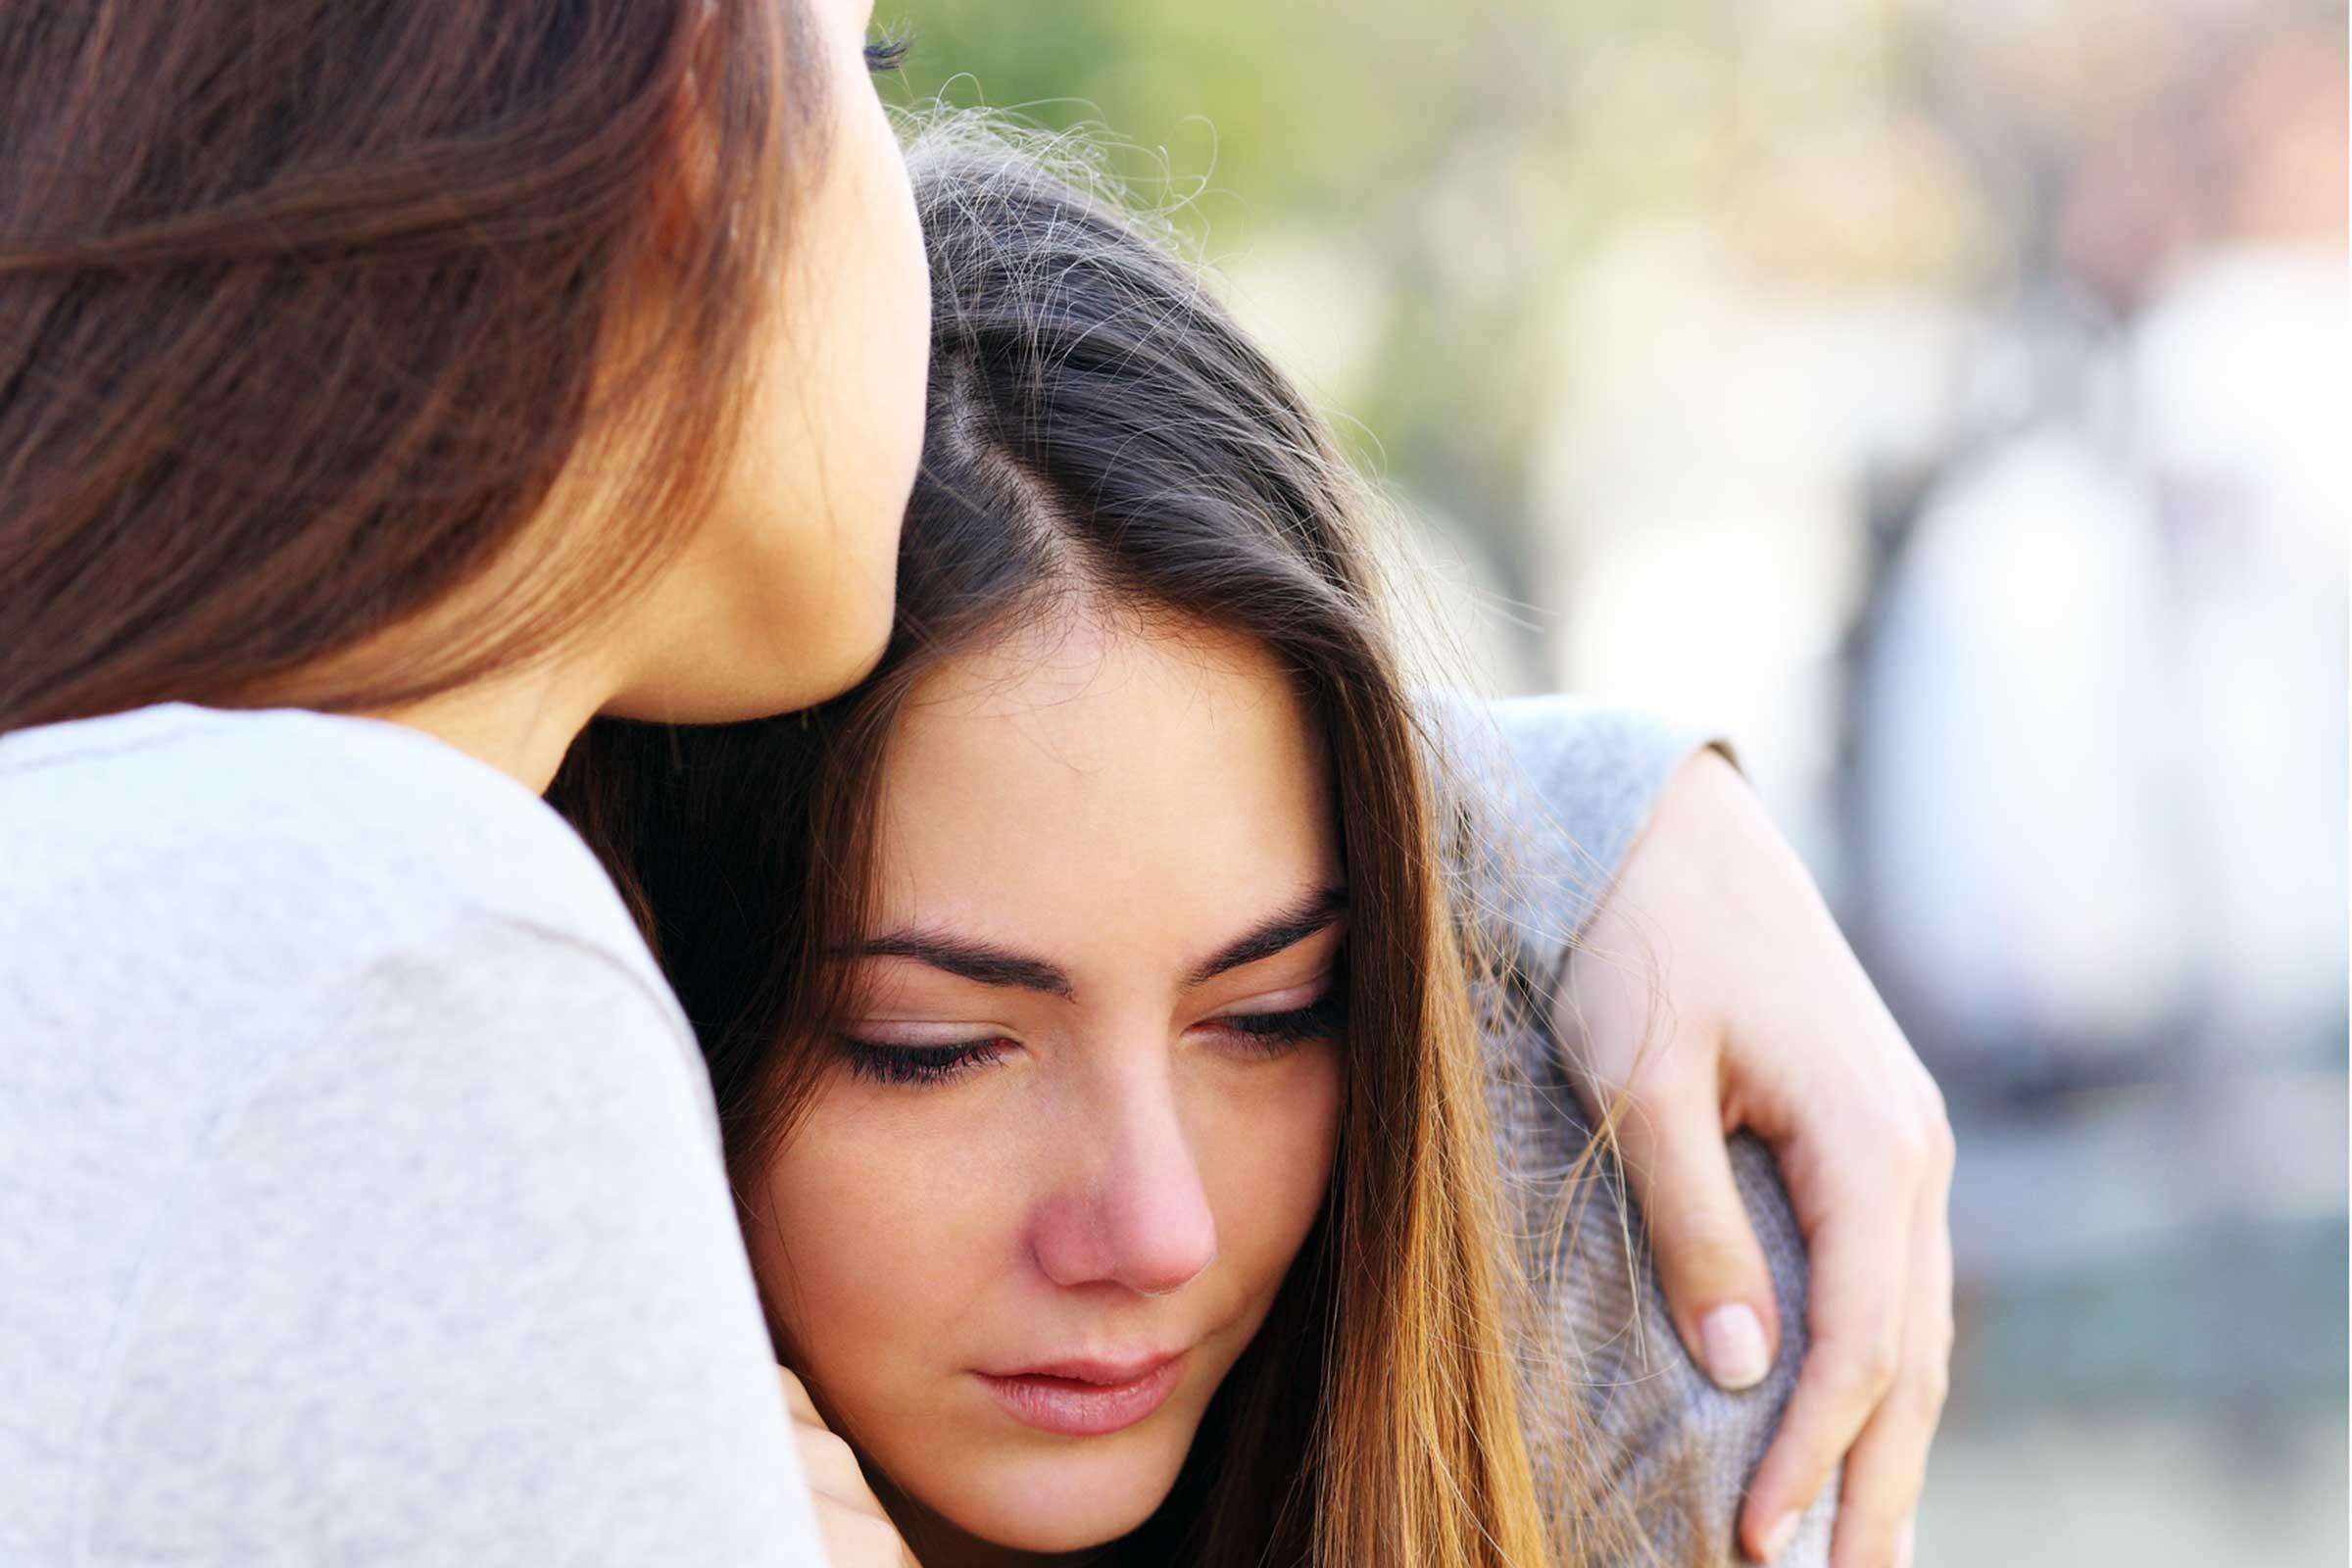 02_ways_help_someone_depression_according_psychologists_dont_know_antonioguillem.jpg